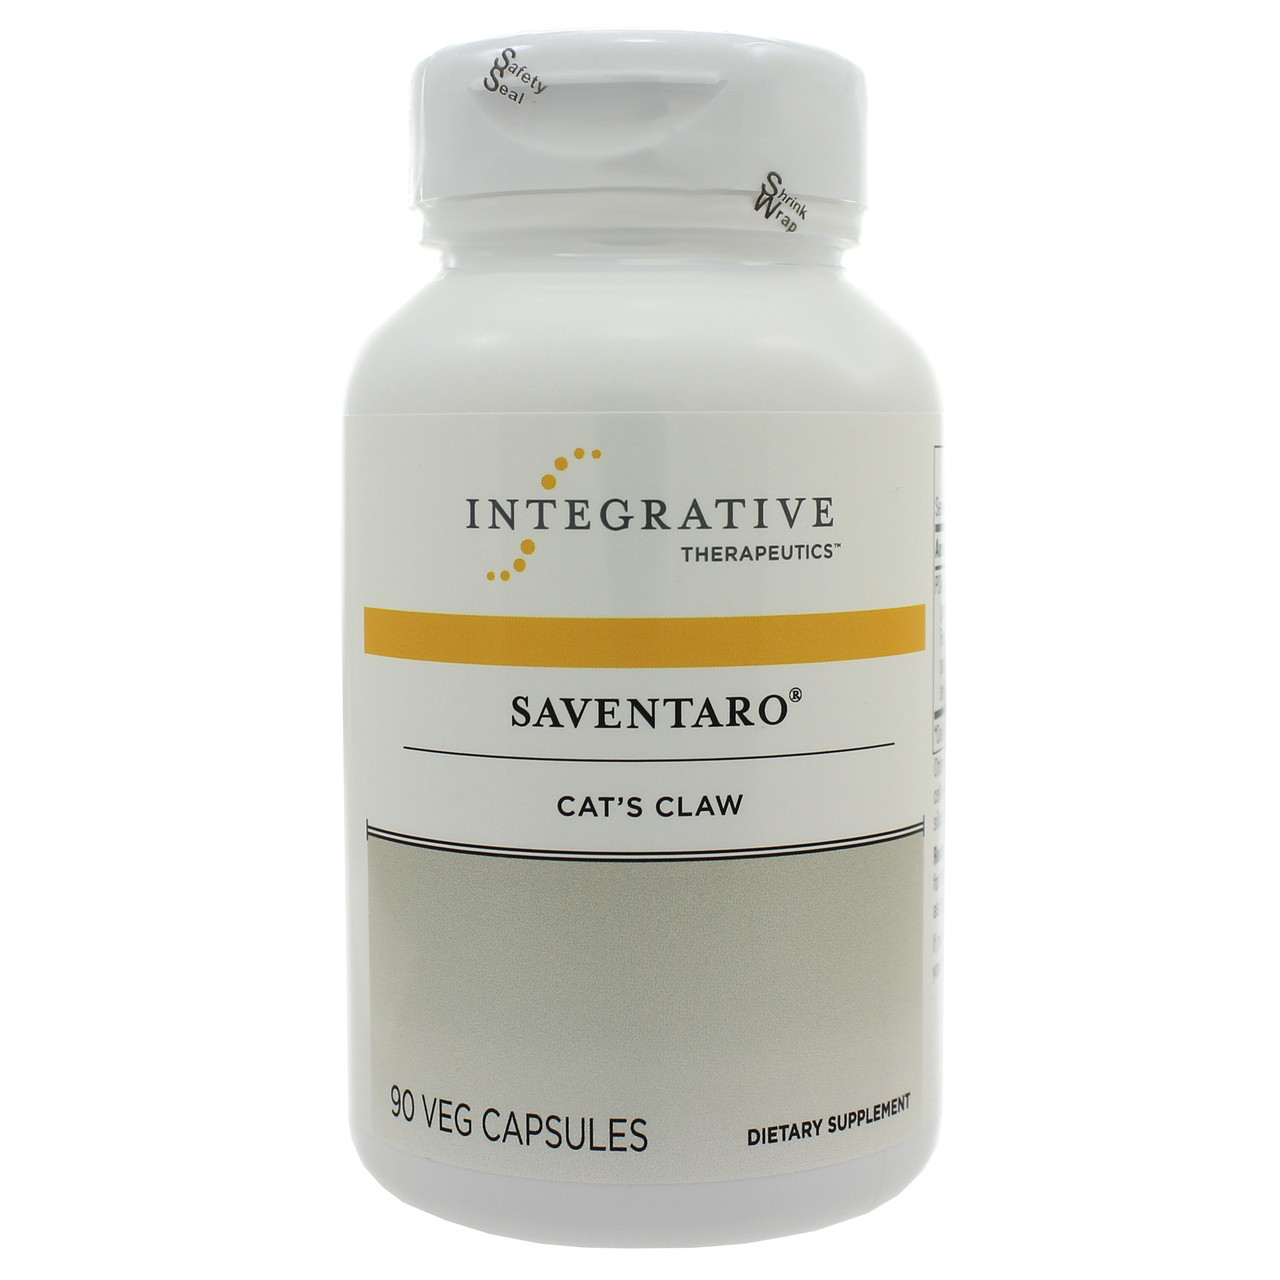 Integrative Therapeutics Saventaro Cat's Claw